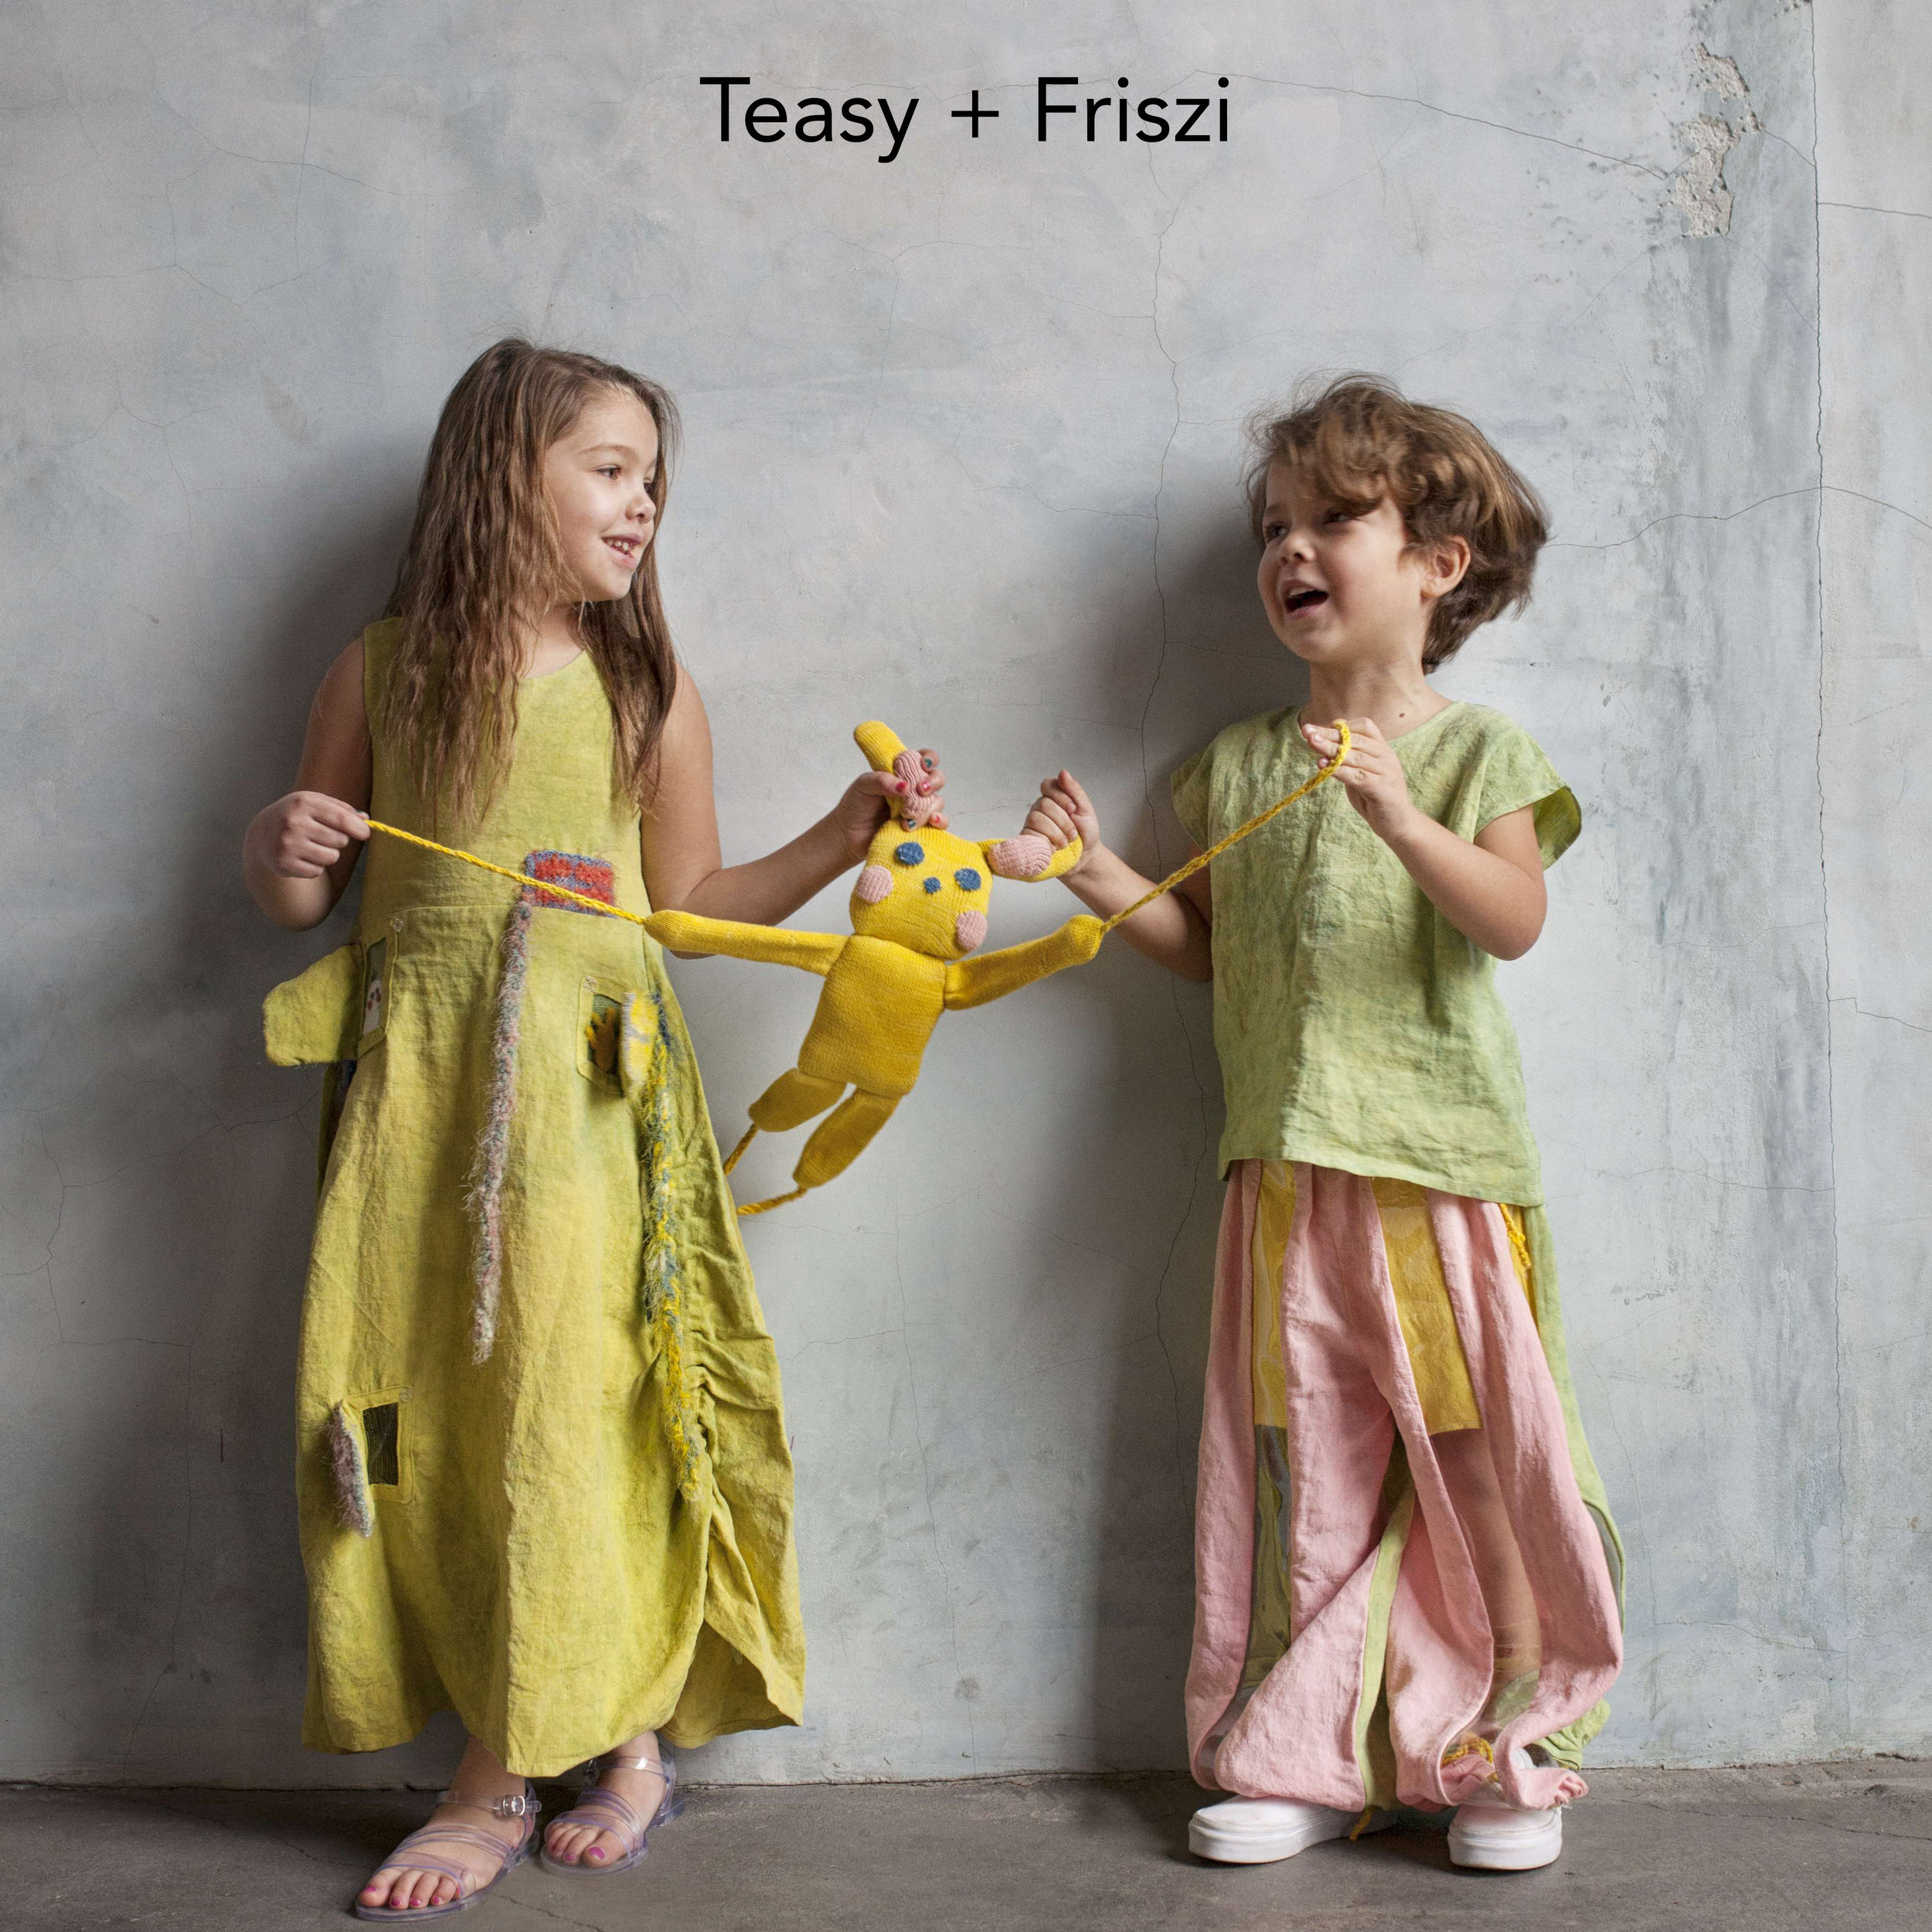 Teasy & Friszi interactive handmade collection